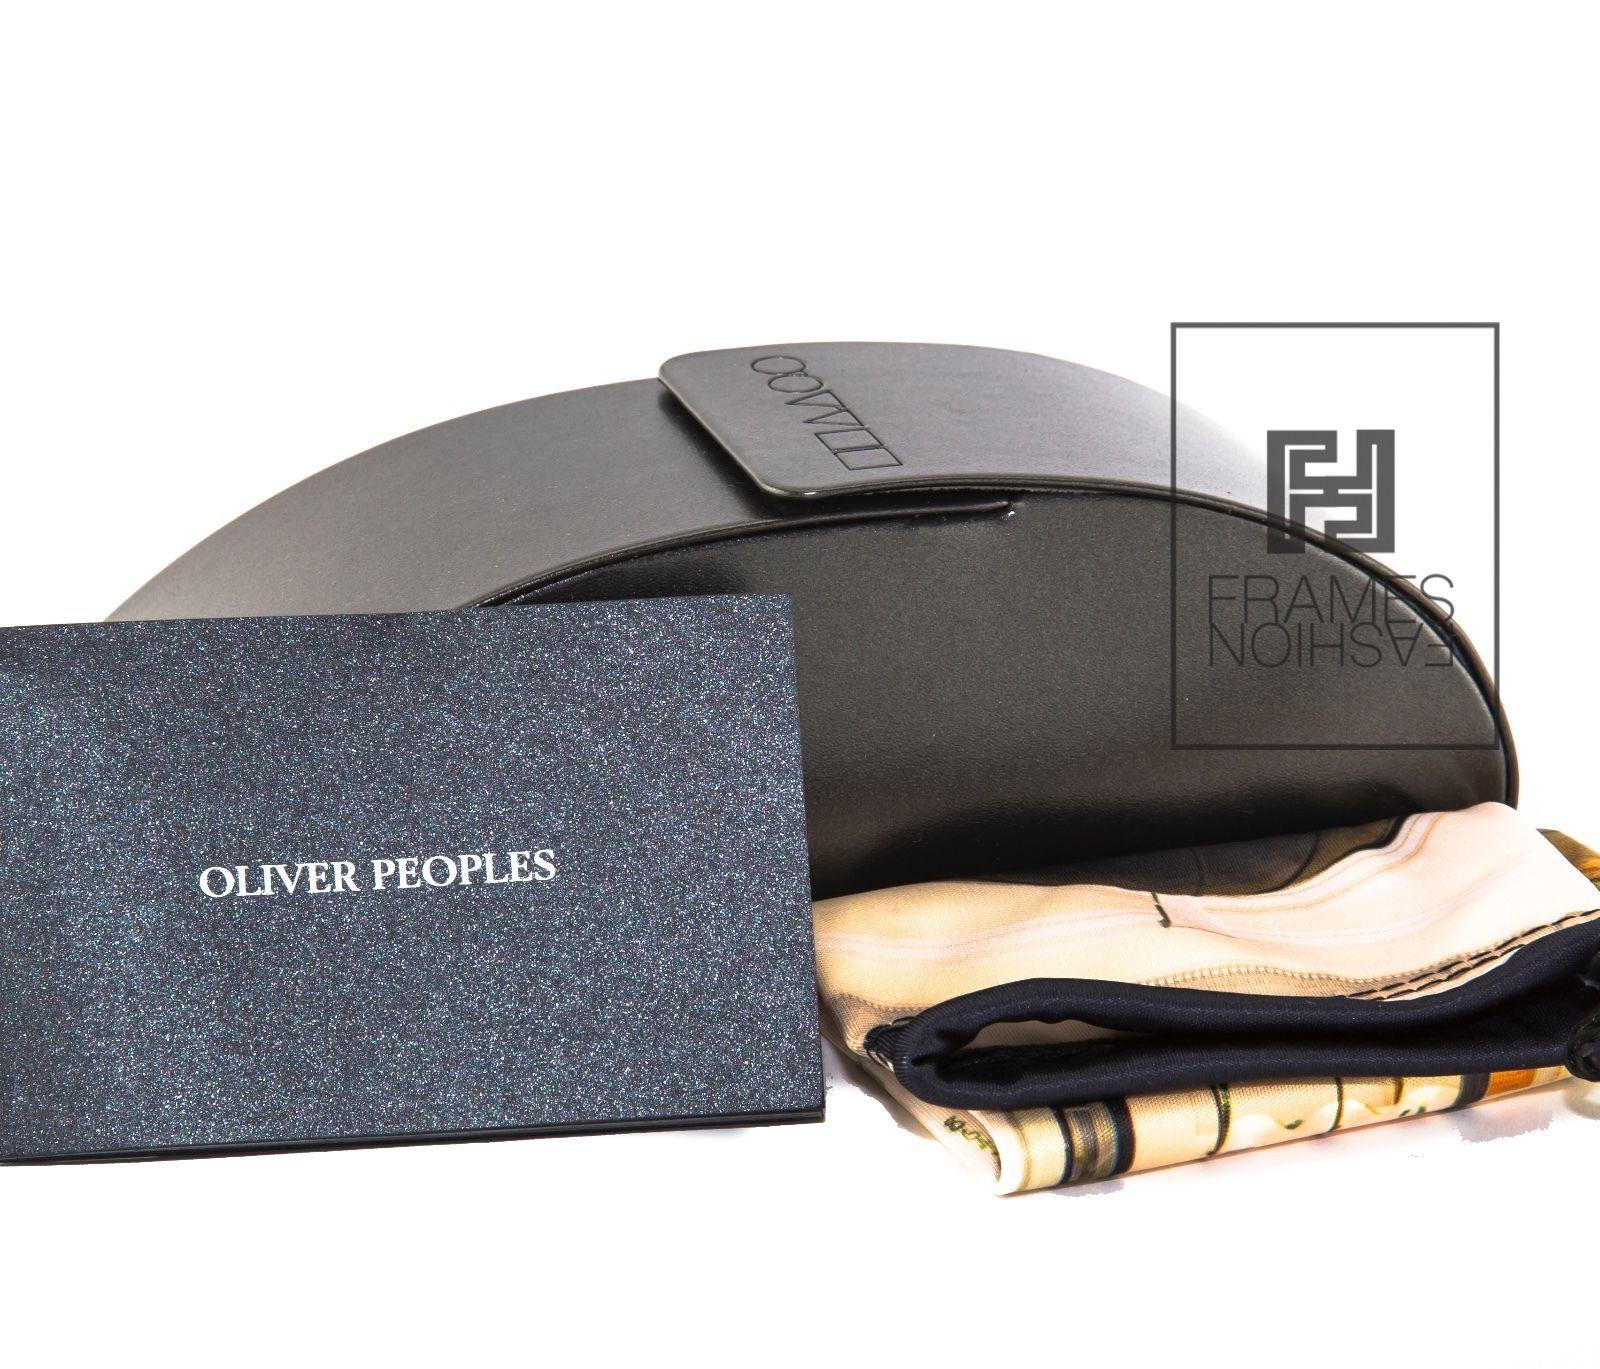 OLIVER PEOPLES Jannsson Sun OV5242S Honey Brown VFX Photochromic Sunglasses 5242 image 8